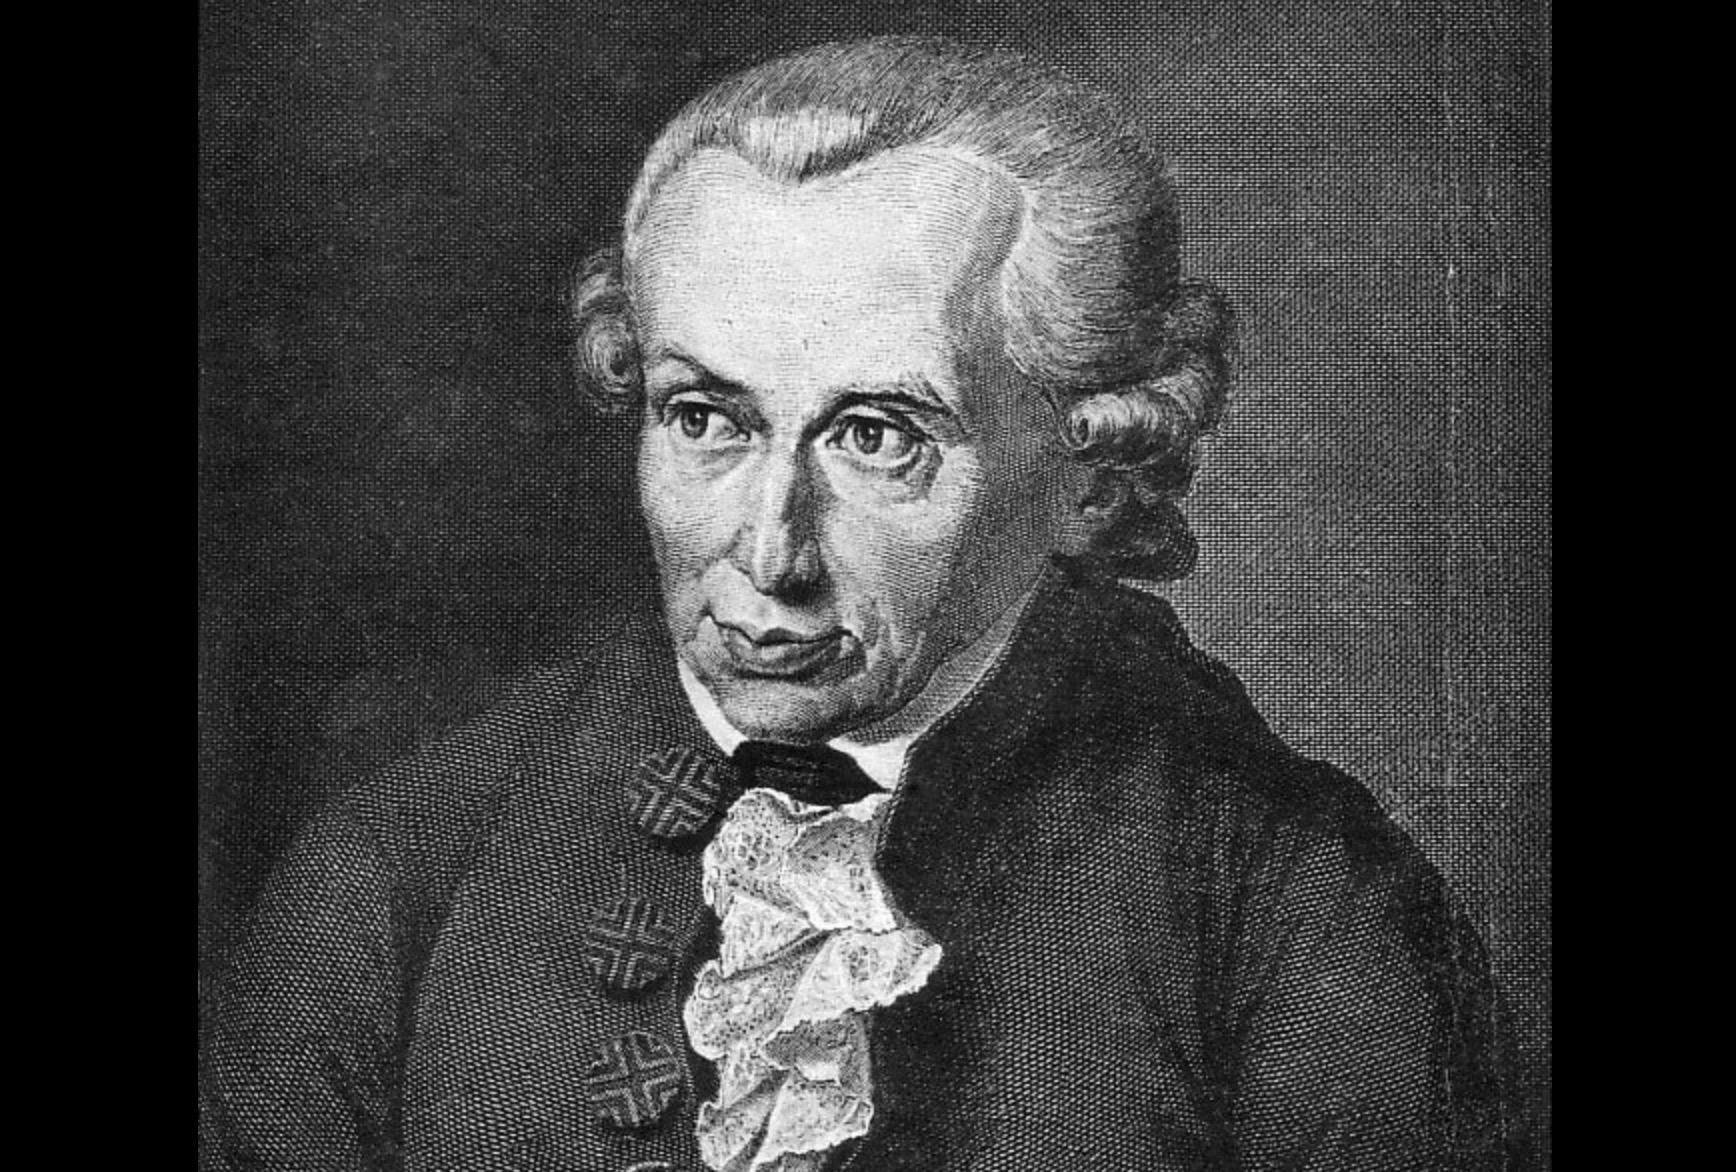 Chýbalo len málo avelikán Kant by upadol do zabudnutia